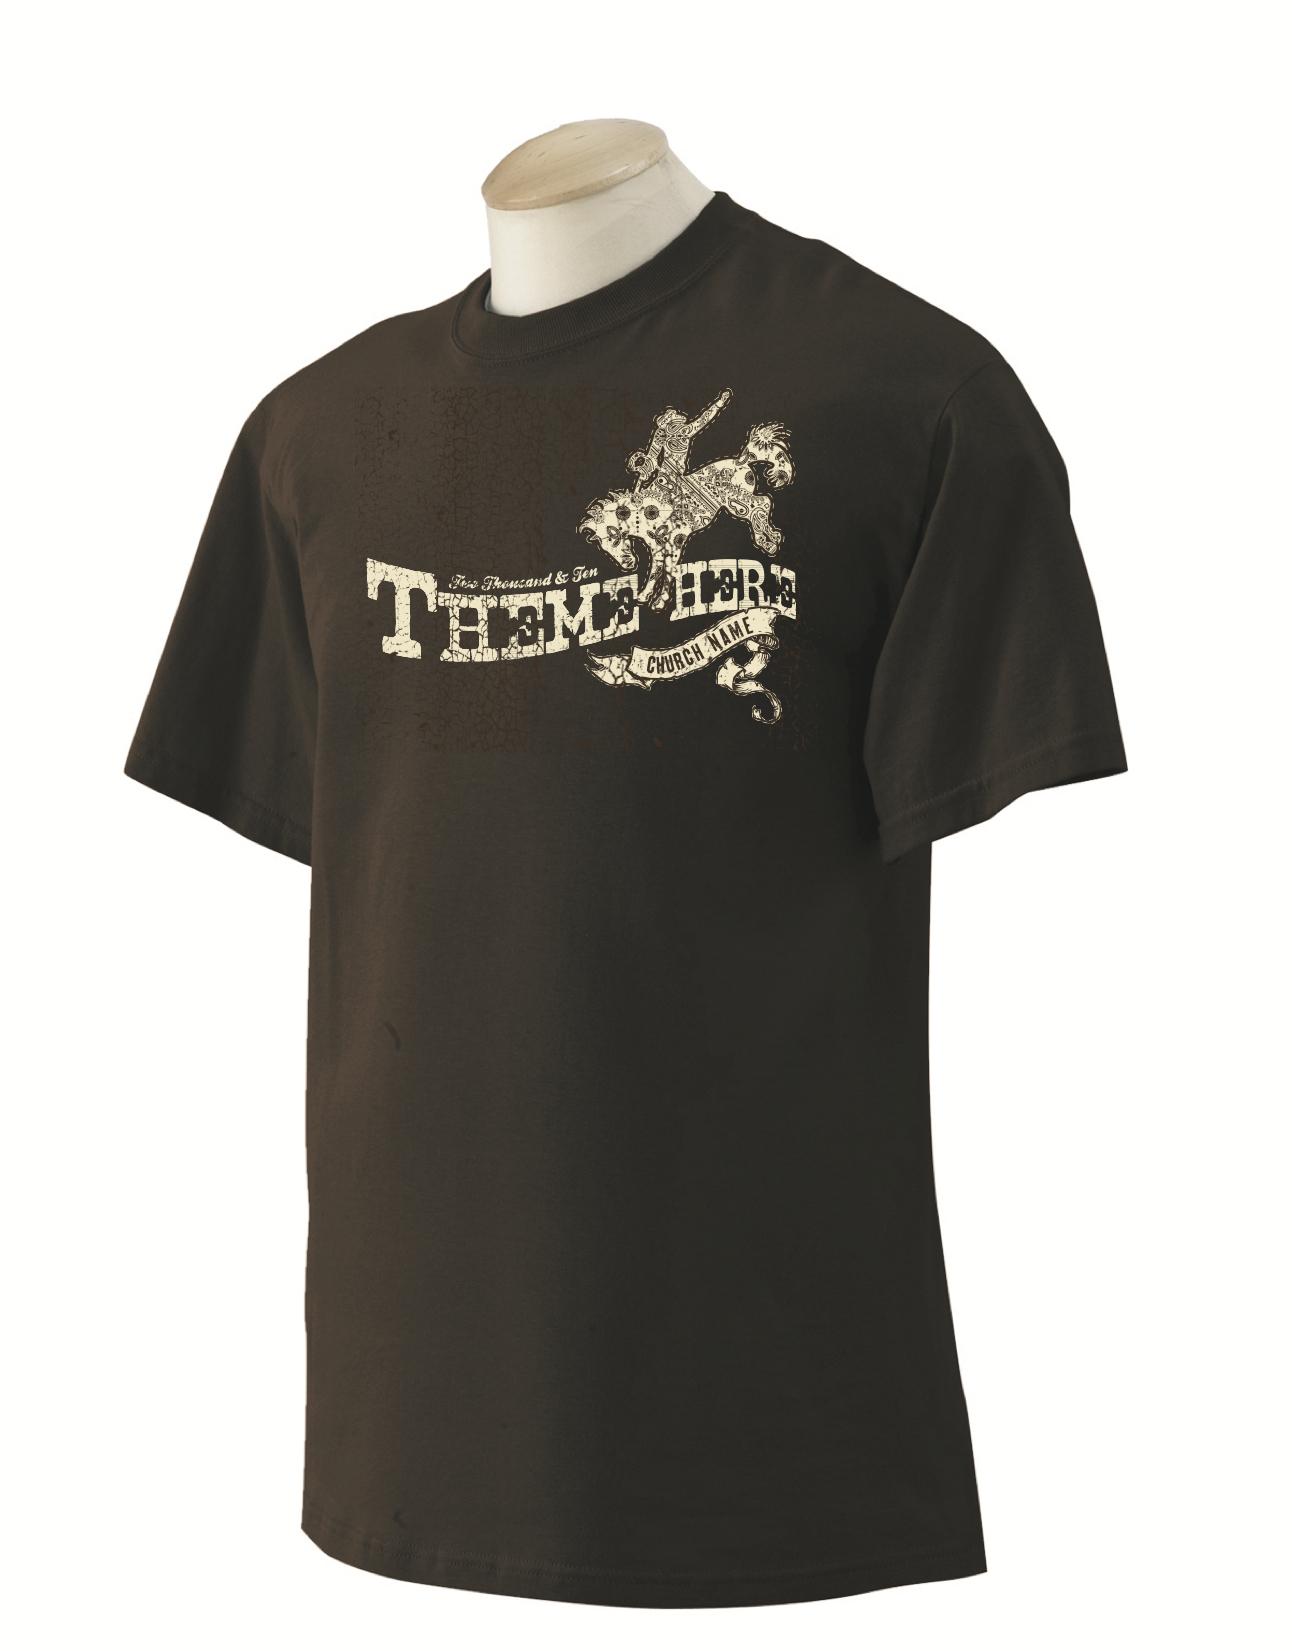 ranch 1 brown shirt.jpg